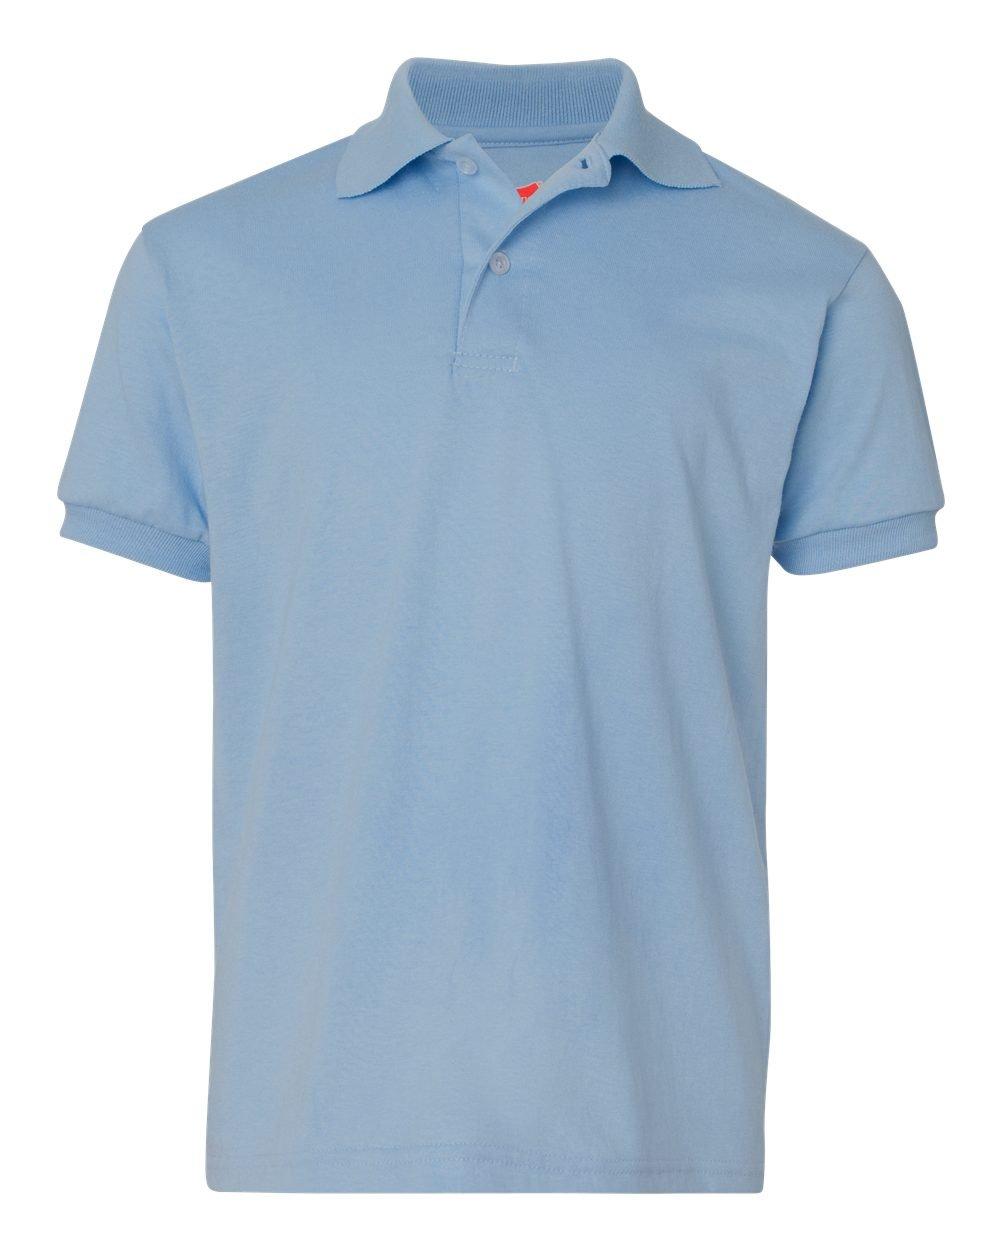 Hanes Boys 50 / 50 ComfortBlend EcoSmartジャージーニットポロ( 054y ) B005GQZH7O M US (Size 8-10) ライトブルー ライトブルー M US (Size 810)